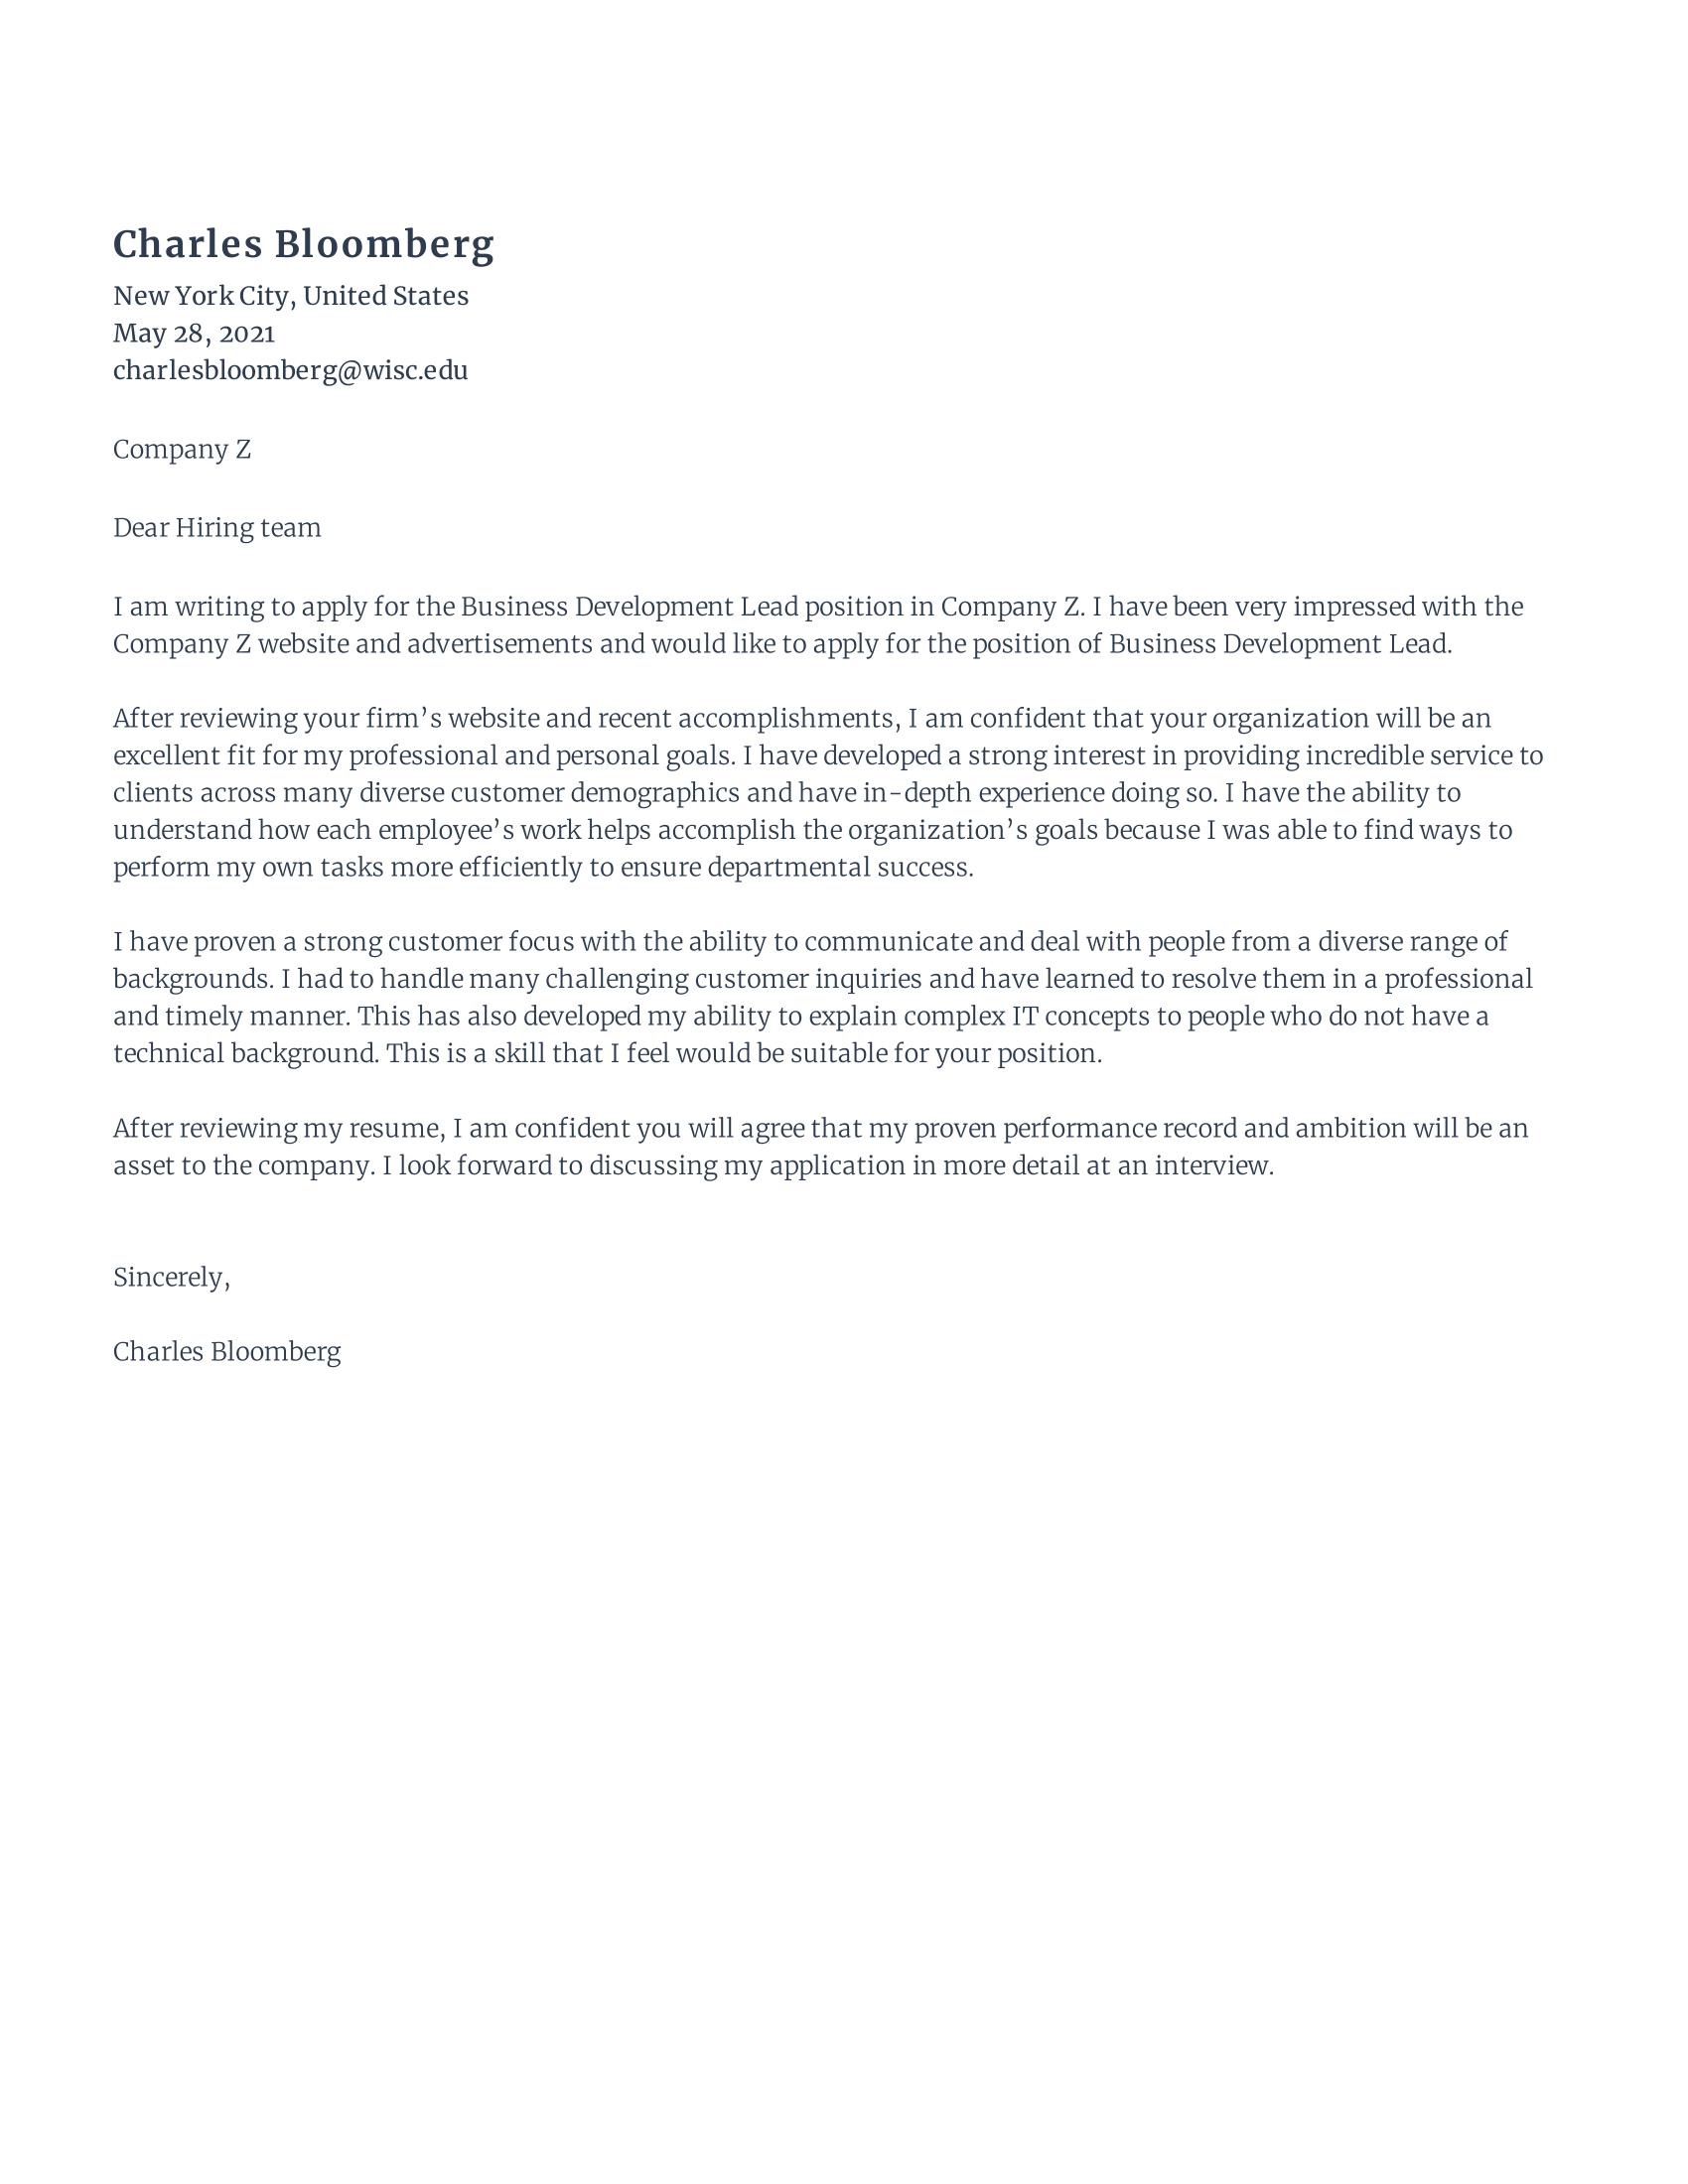 Business Improvement Lead Cover Letter